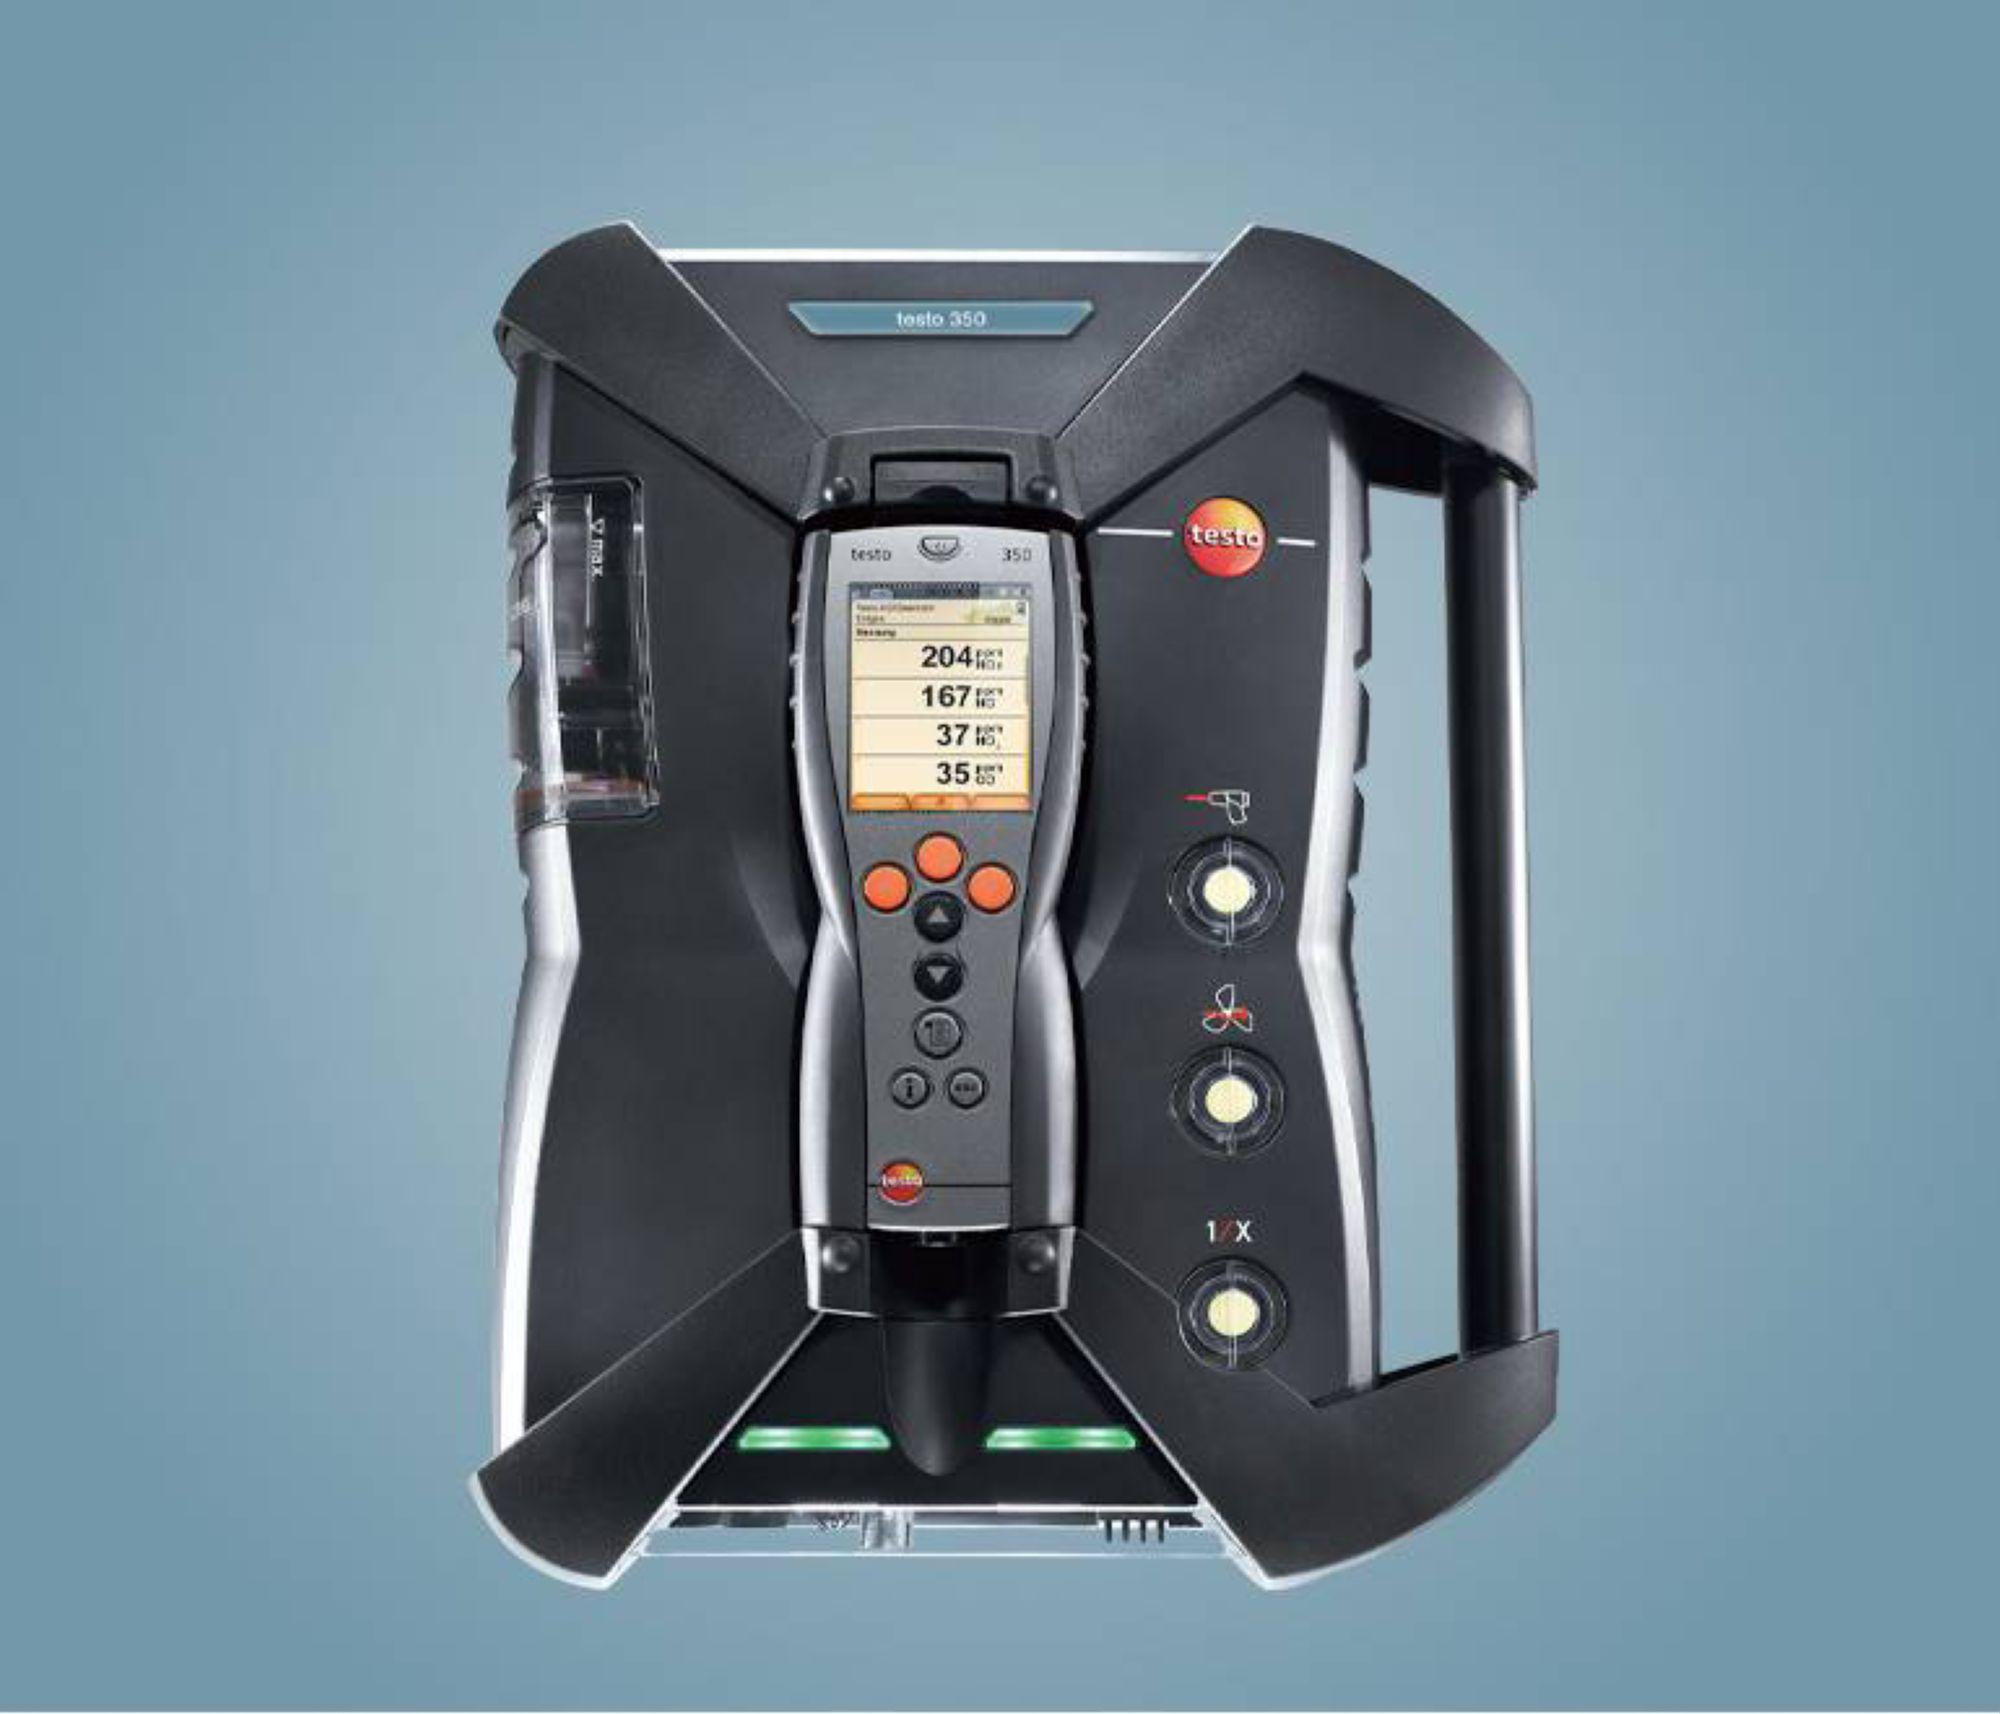 testo 350 烟气分析仪分析箱-蓝色新版